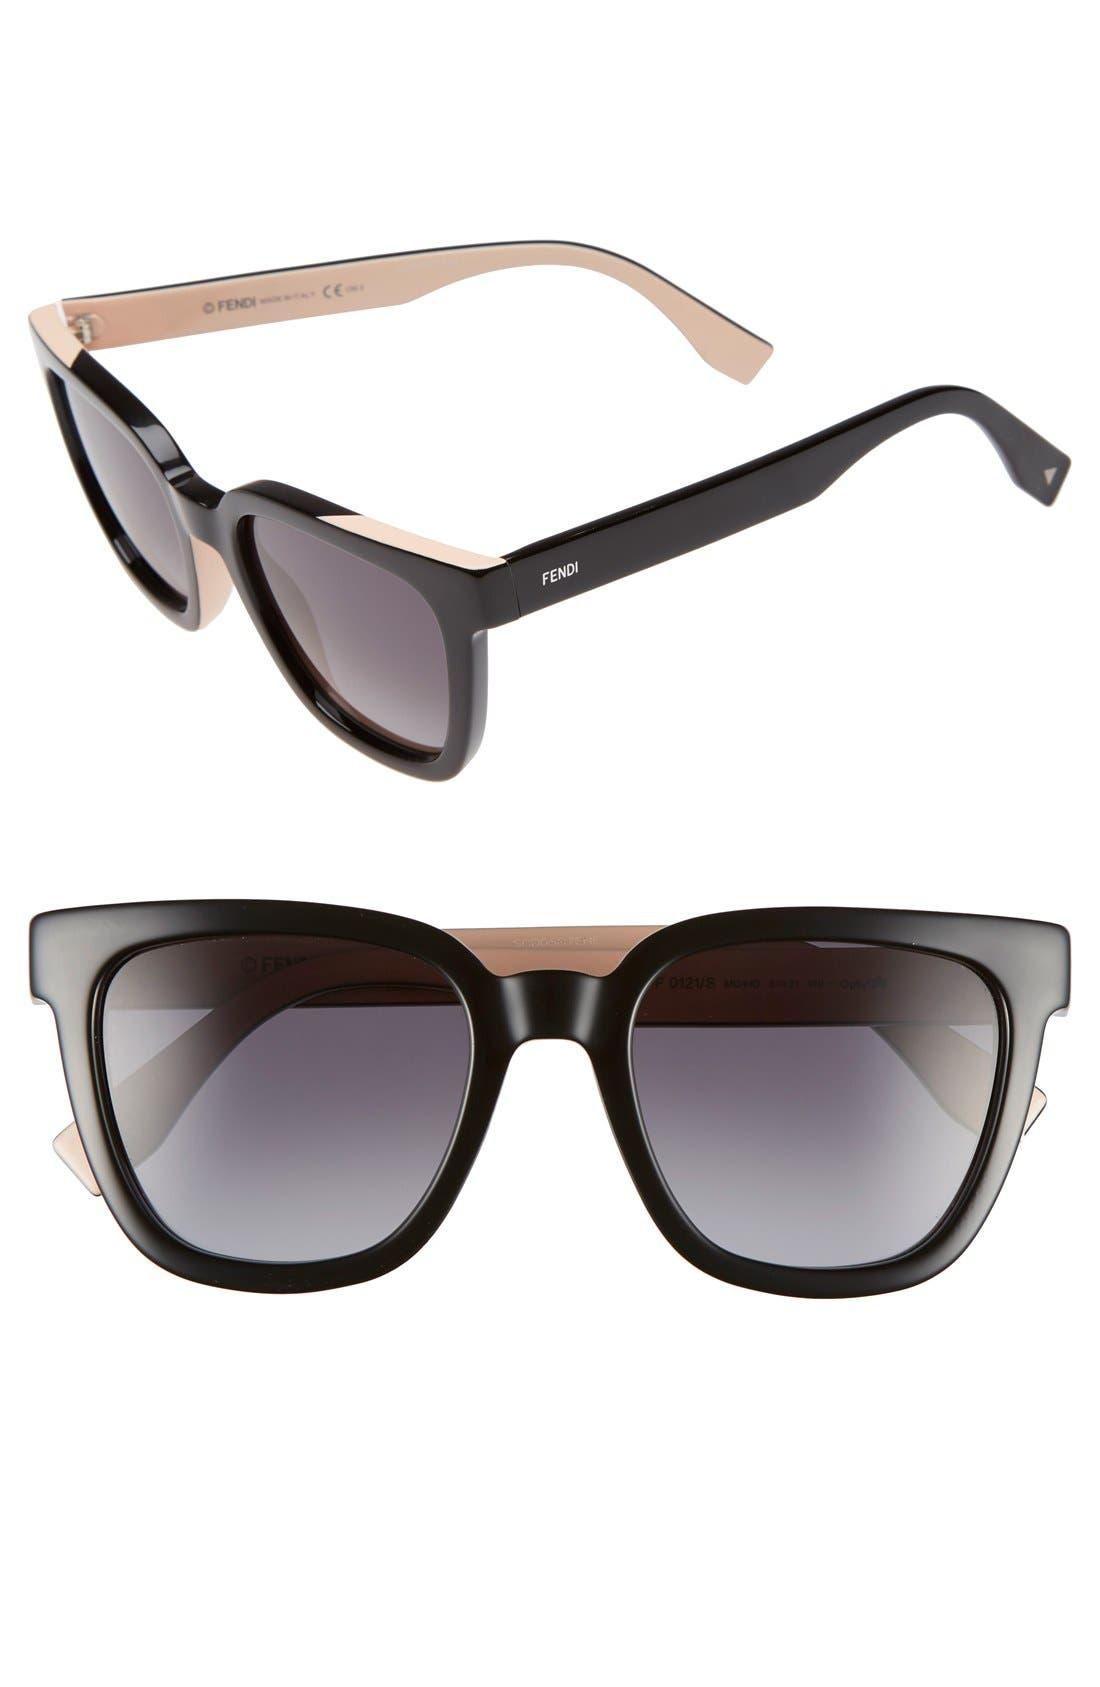 Alternate Image 1 Selected - Fendi 51mm Sunglasses